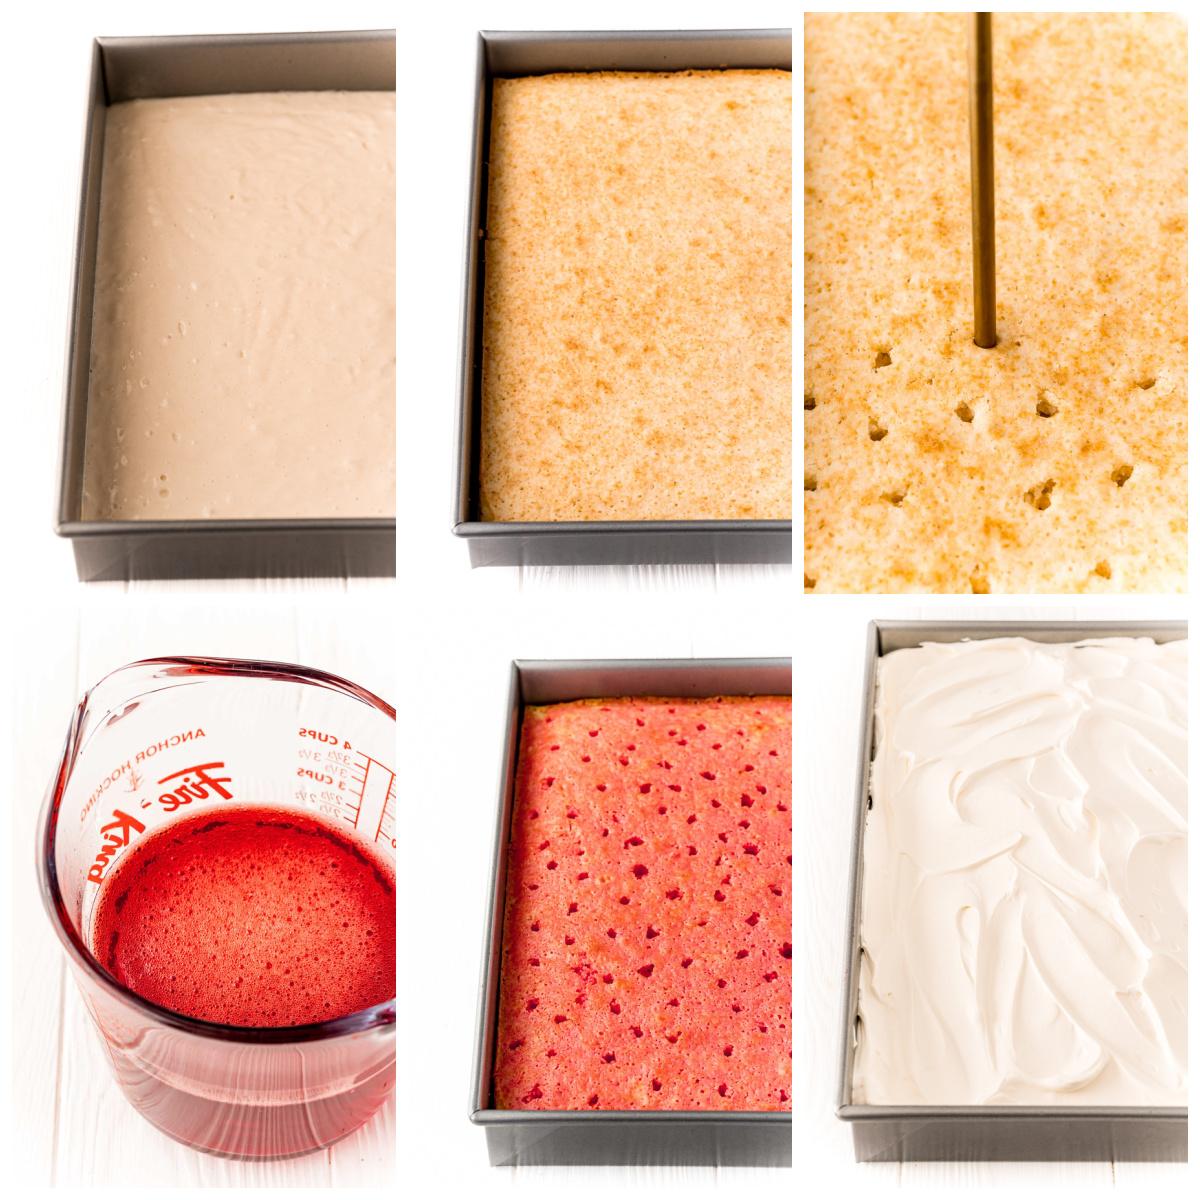 Step by step photos on how to make a Jello Poke Cake